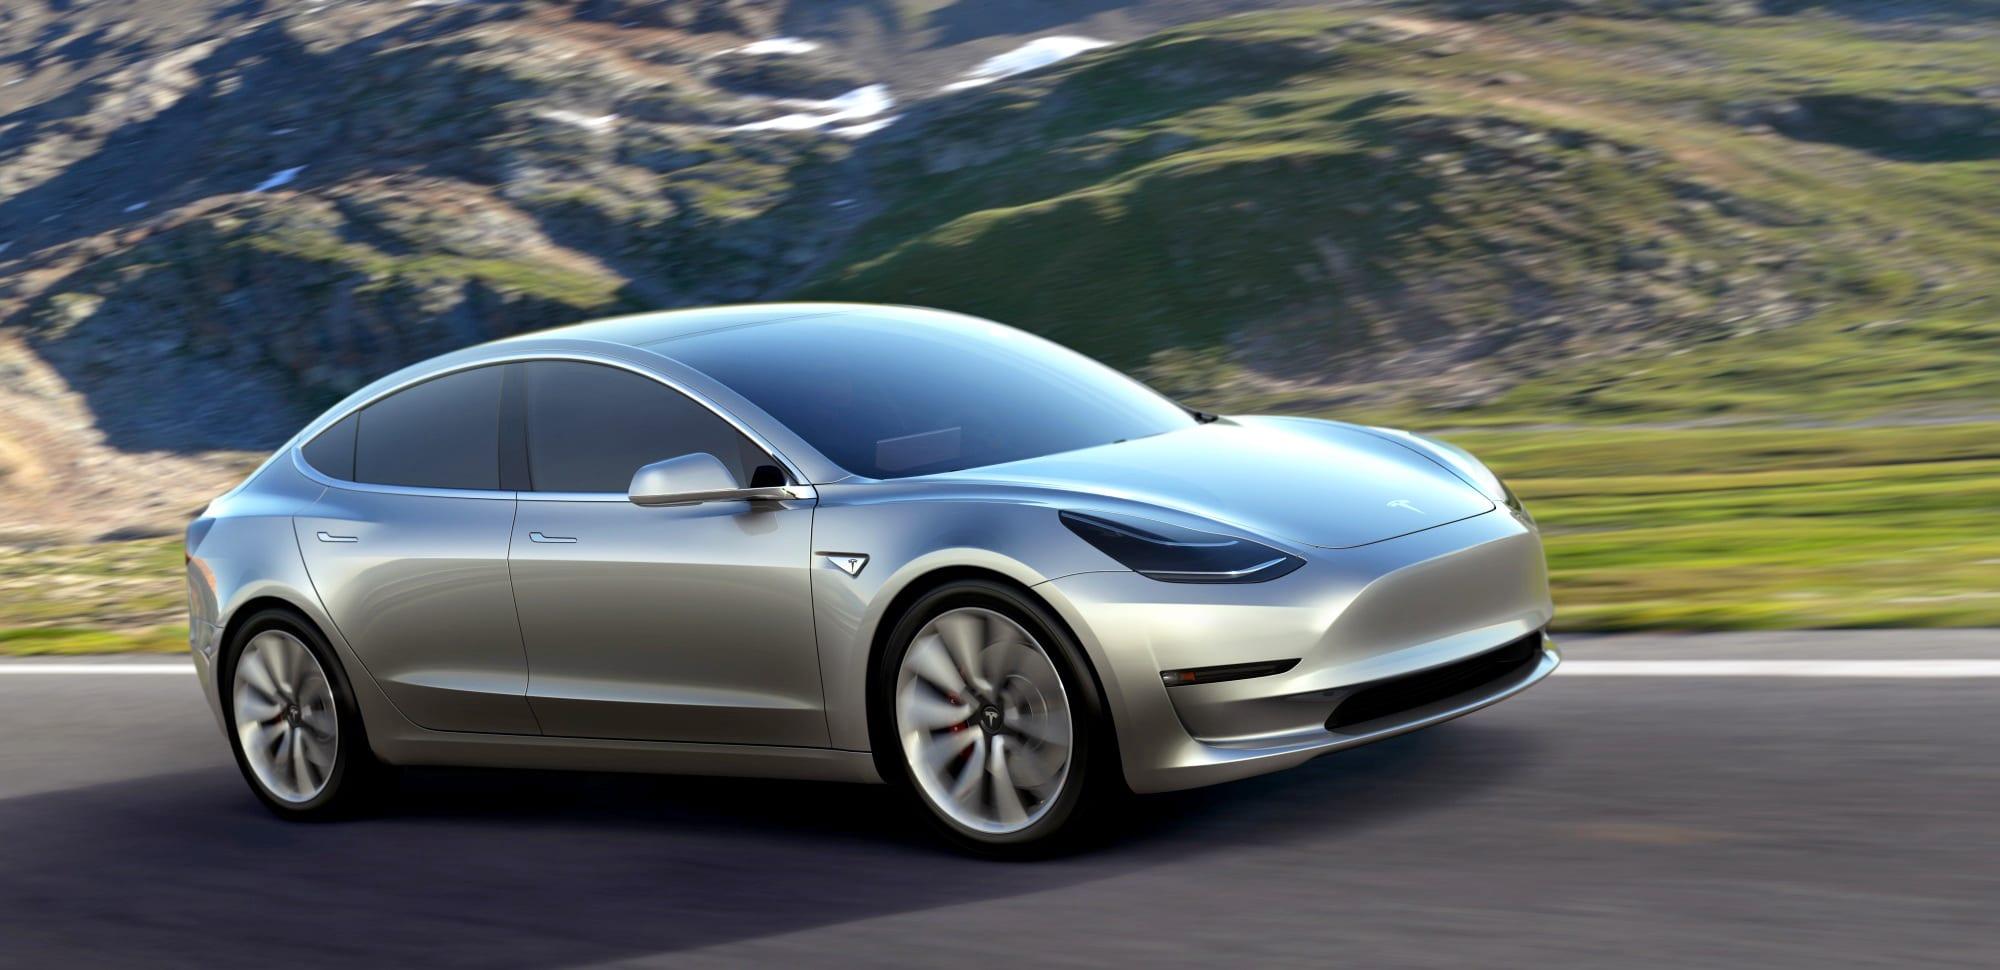 Tesla unveils its $35,000 Model 3